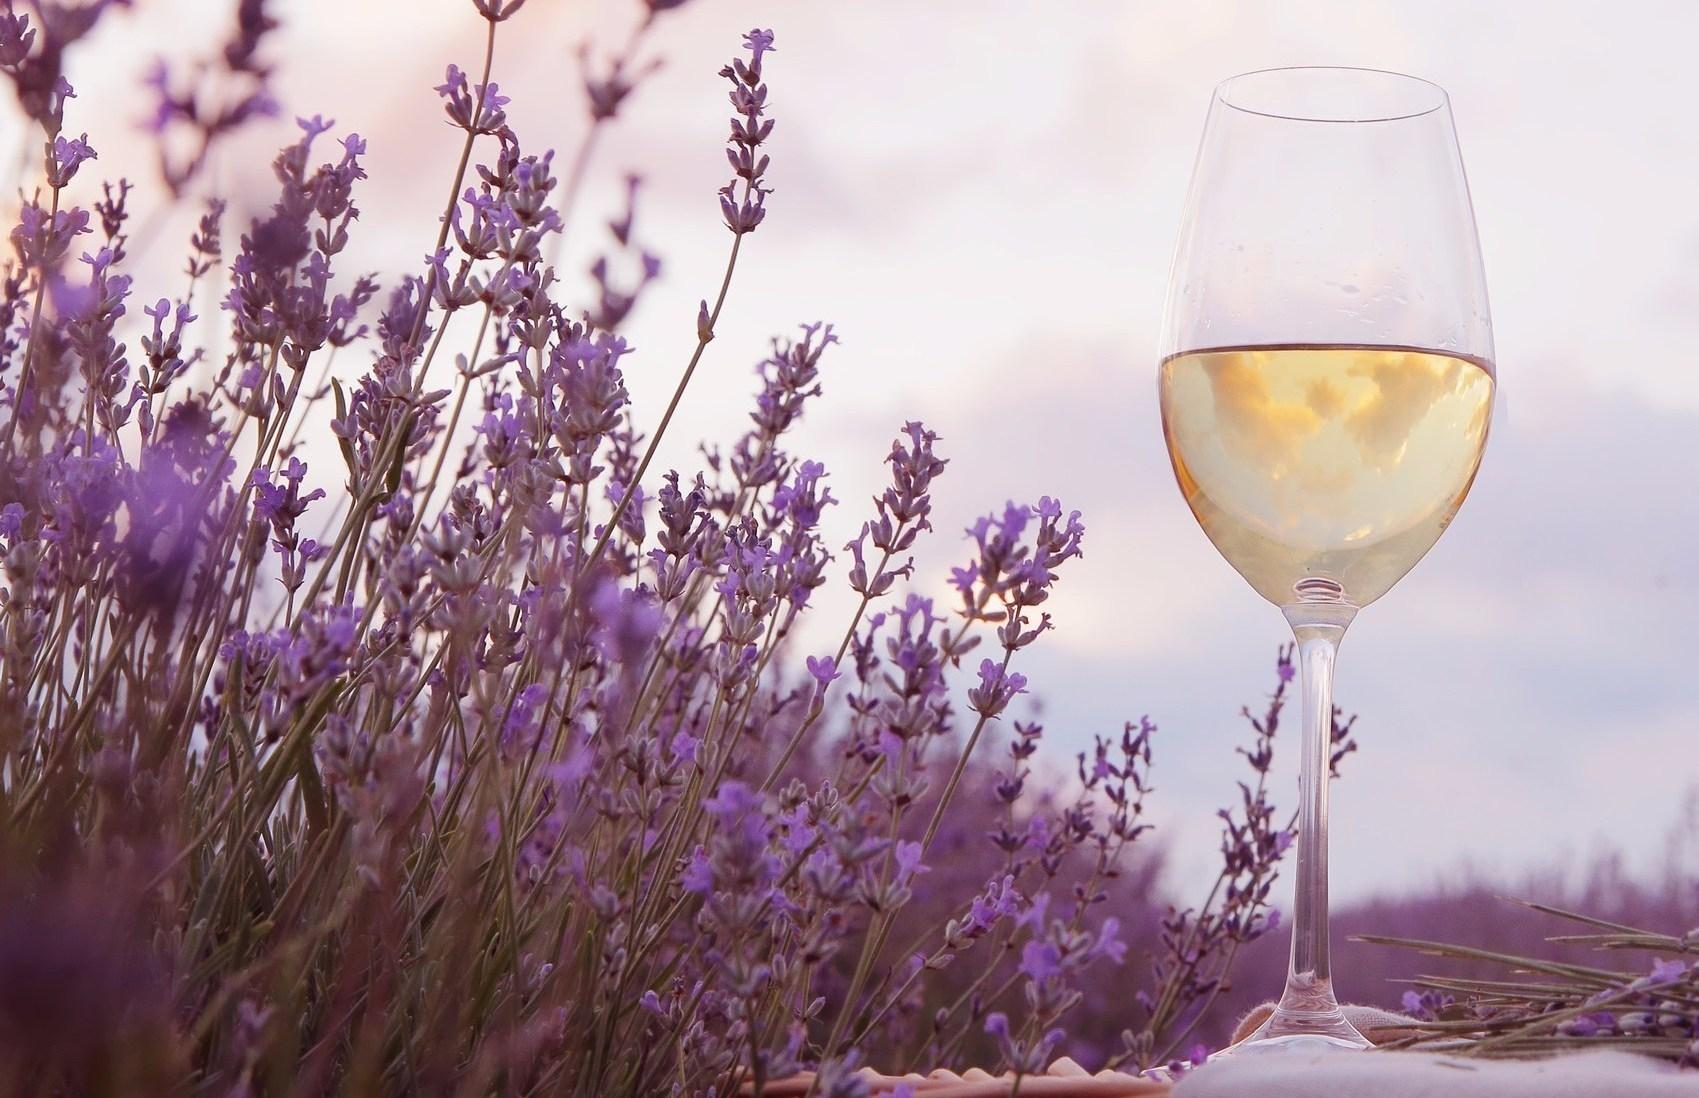 Vin avignonais